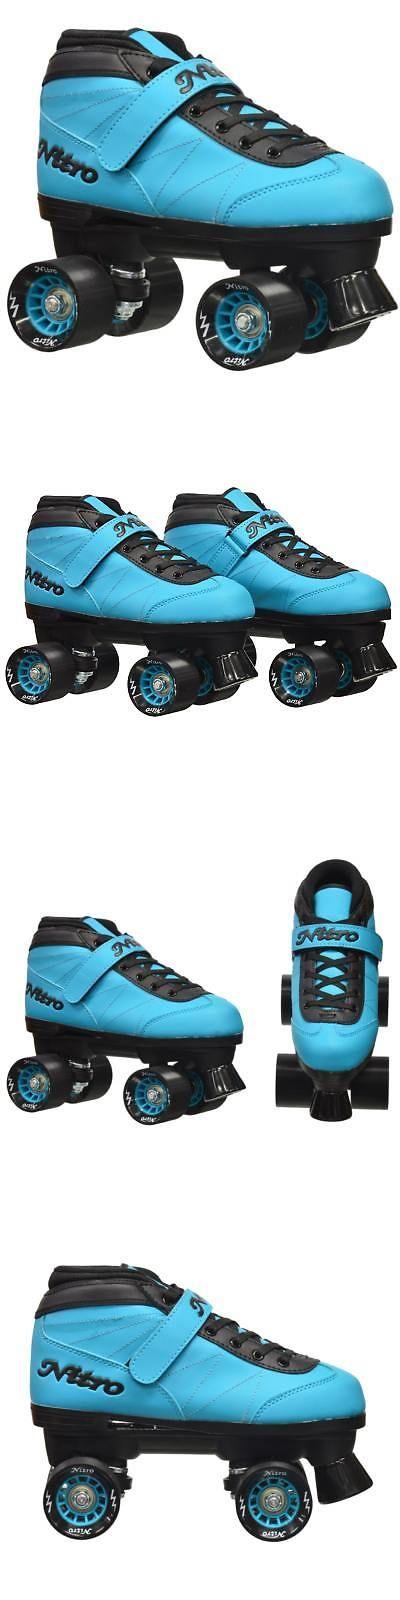 Women 16261: Epic Nitro Turbo Blue Quad Speed Roller Skates -> BUY IT NOW ONLY: $79.99 on eBay!